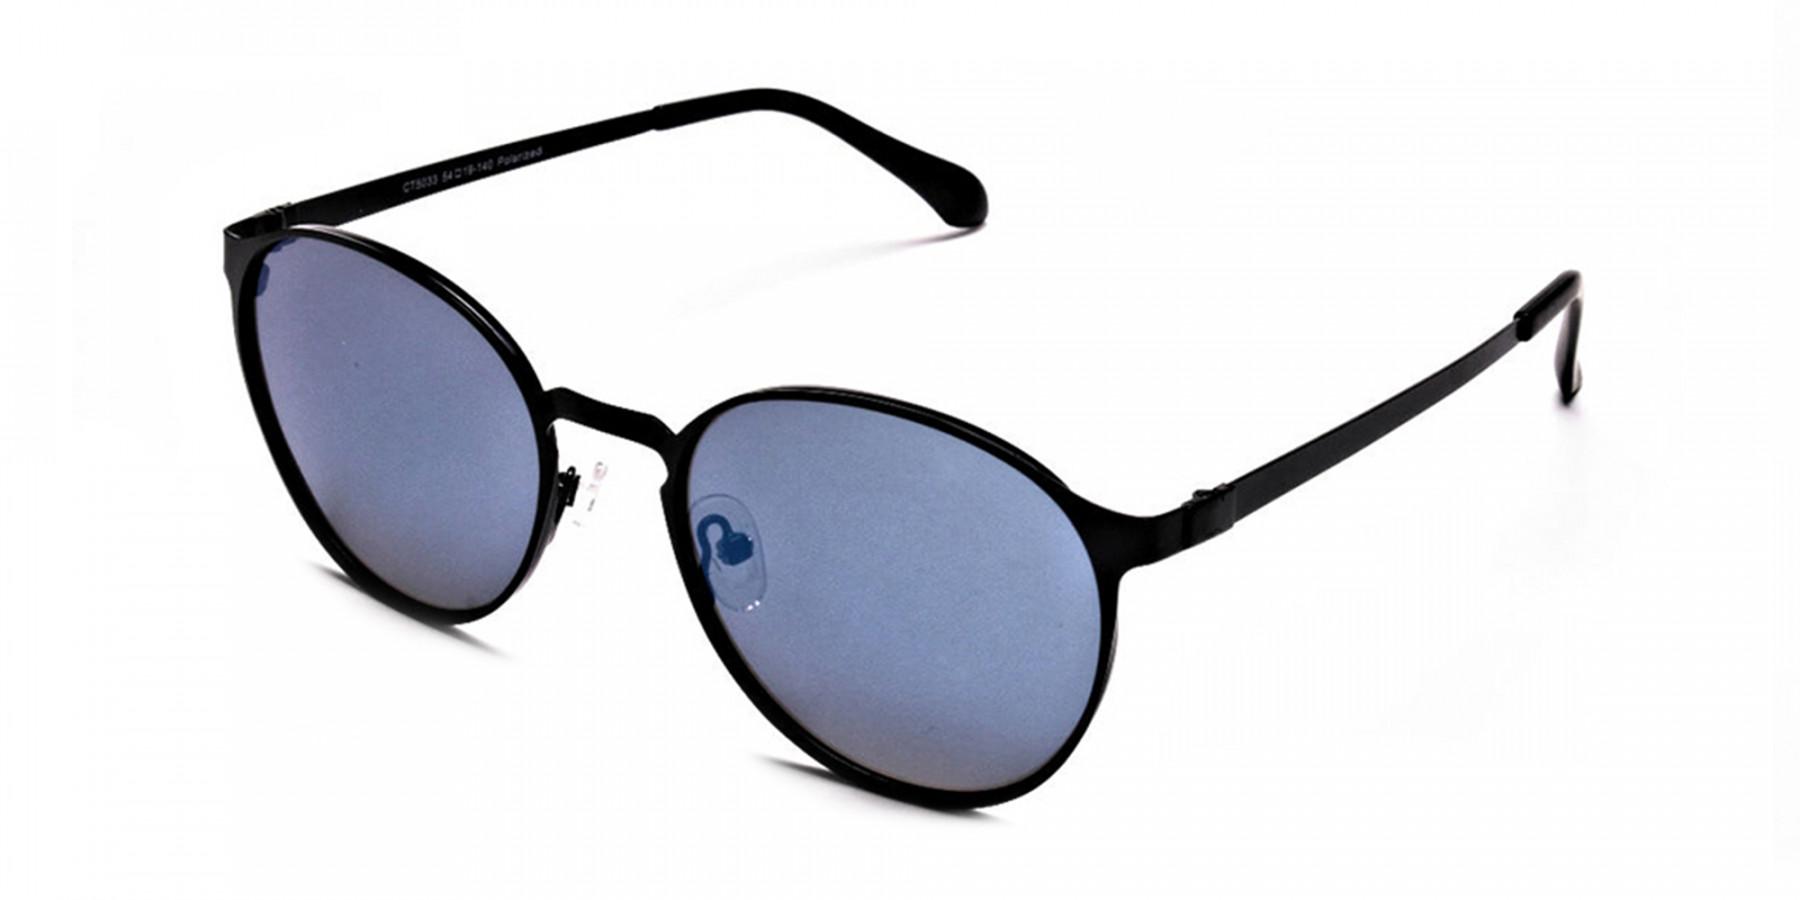 Retro Round Blue Sunglasses - 2